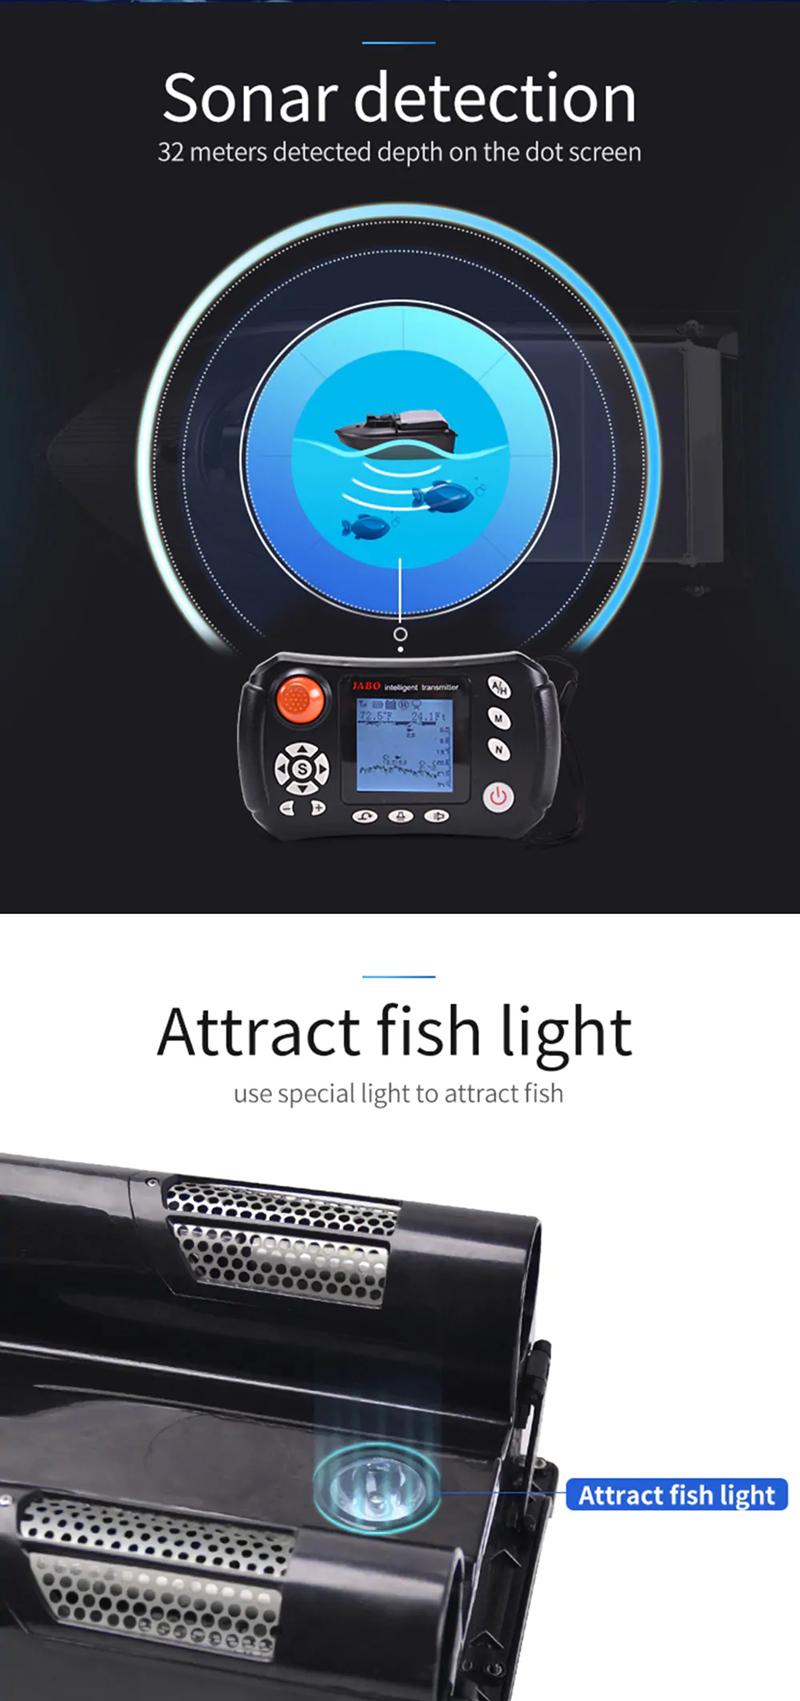 ZANLURE Auto Return Fishing Bait Boat Autopilot 2 4G GPS Carp Fishing  Feeder With Metal Propeller Guard